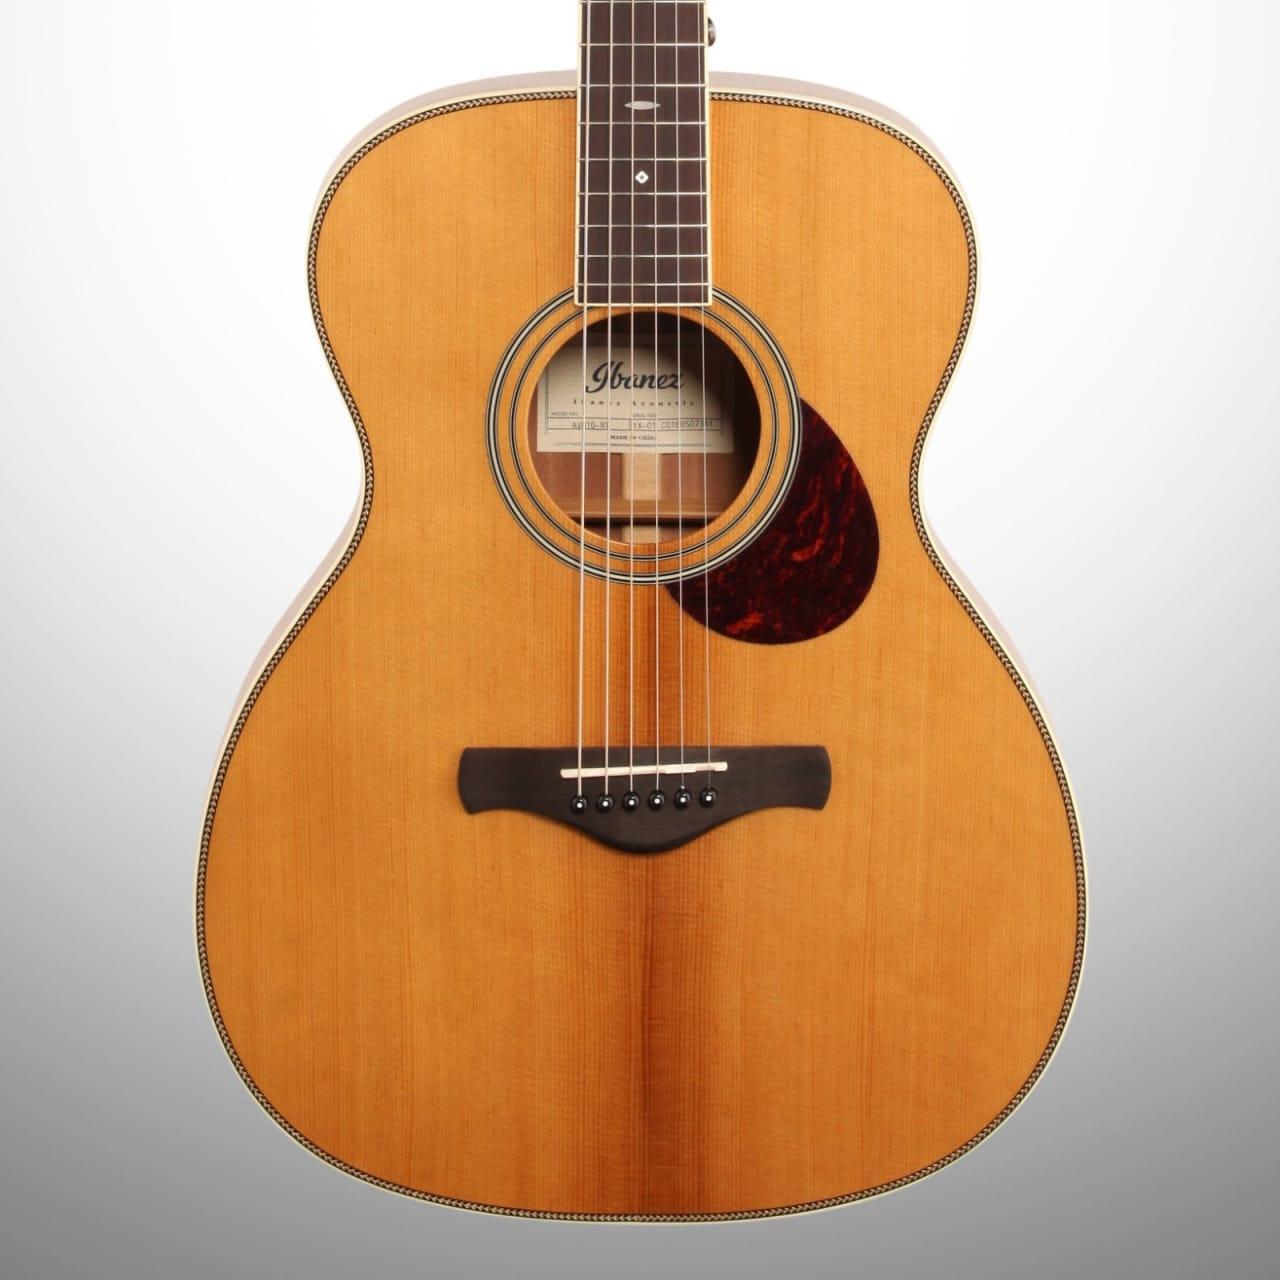 ibanez avm10 artwood vintage acoustic guitar zzounds reverb. Black Bedroom Furniture Sets. Home Design Ideas